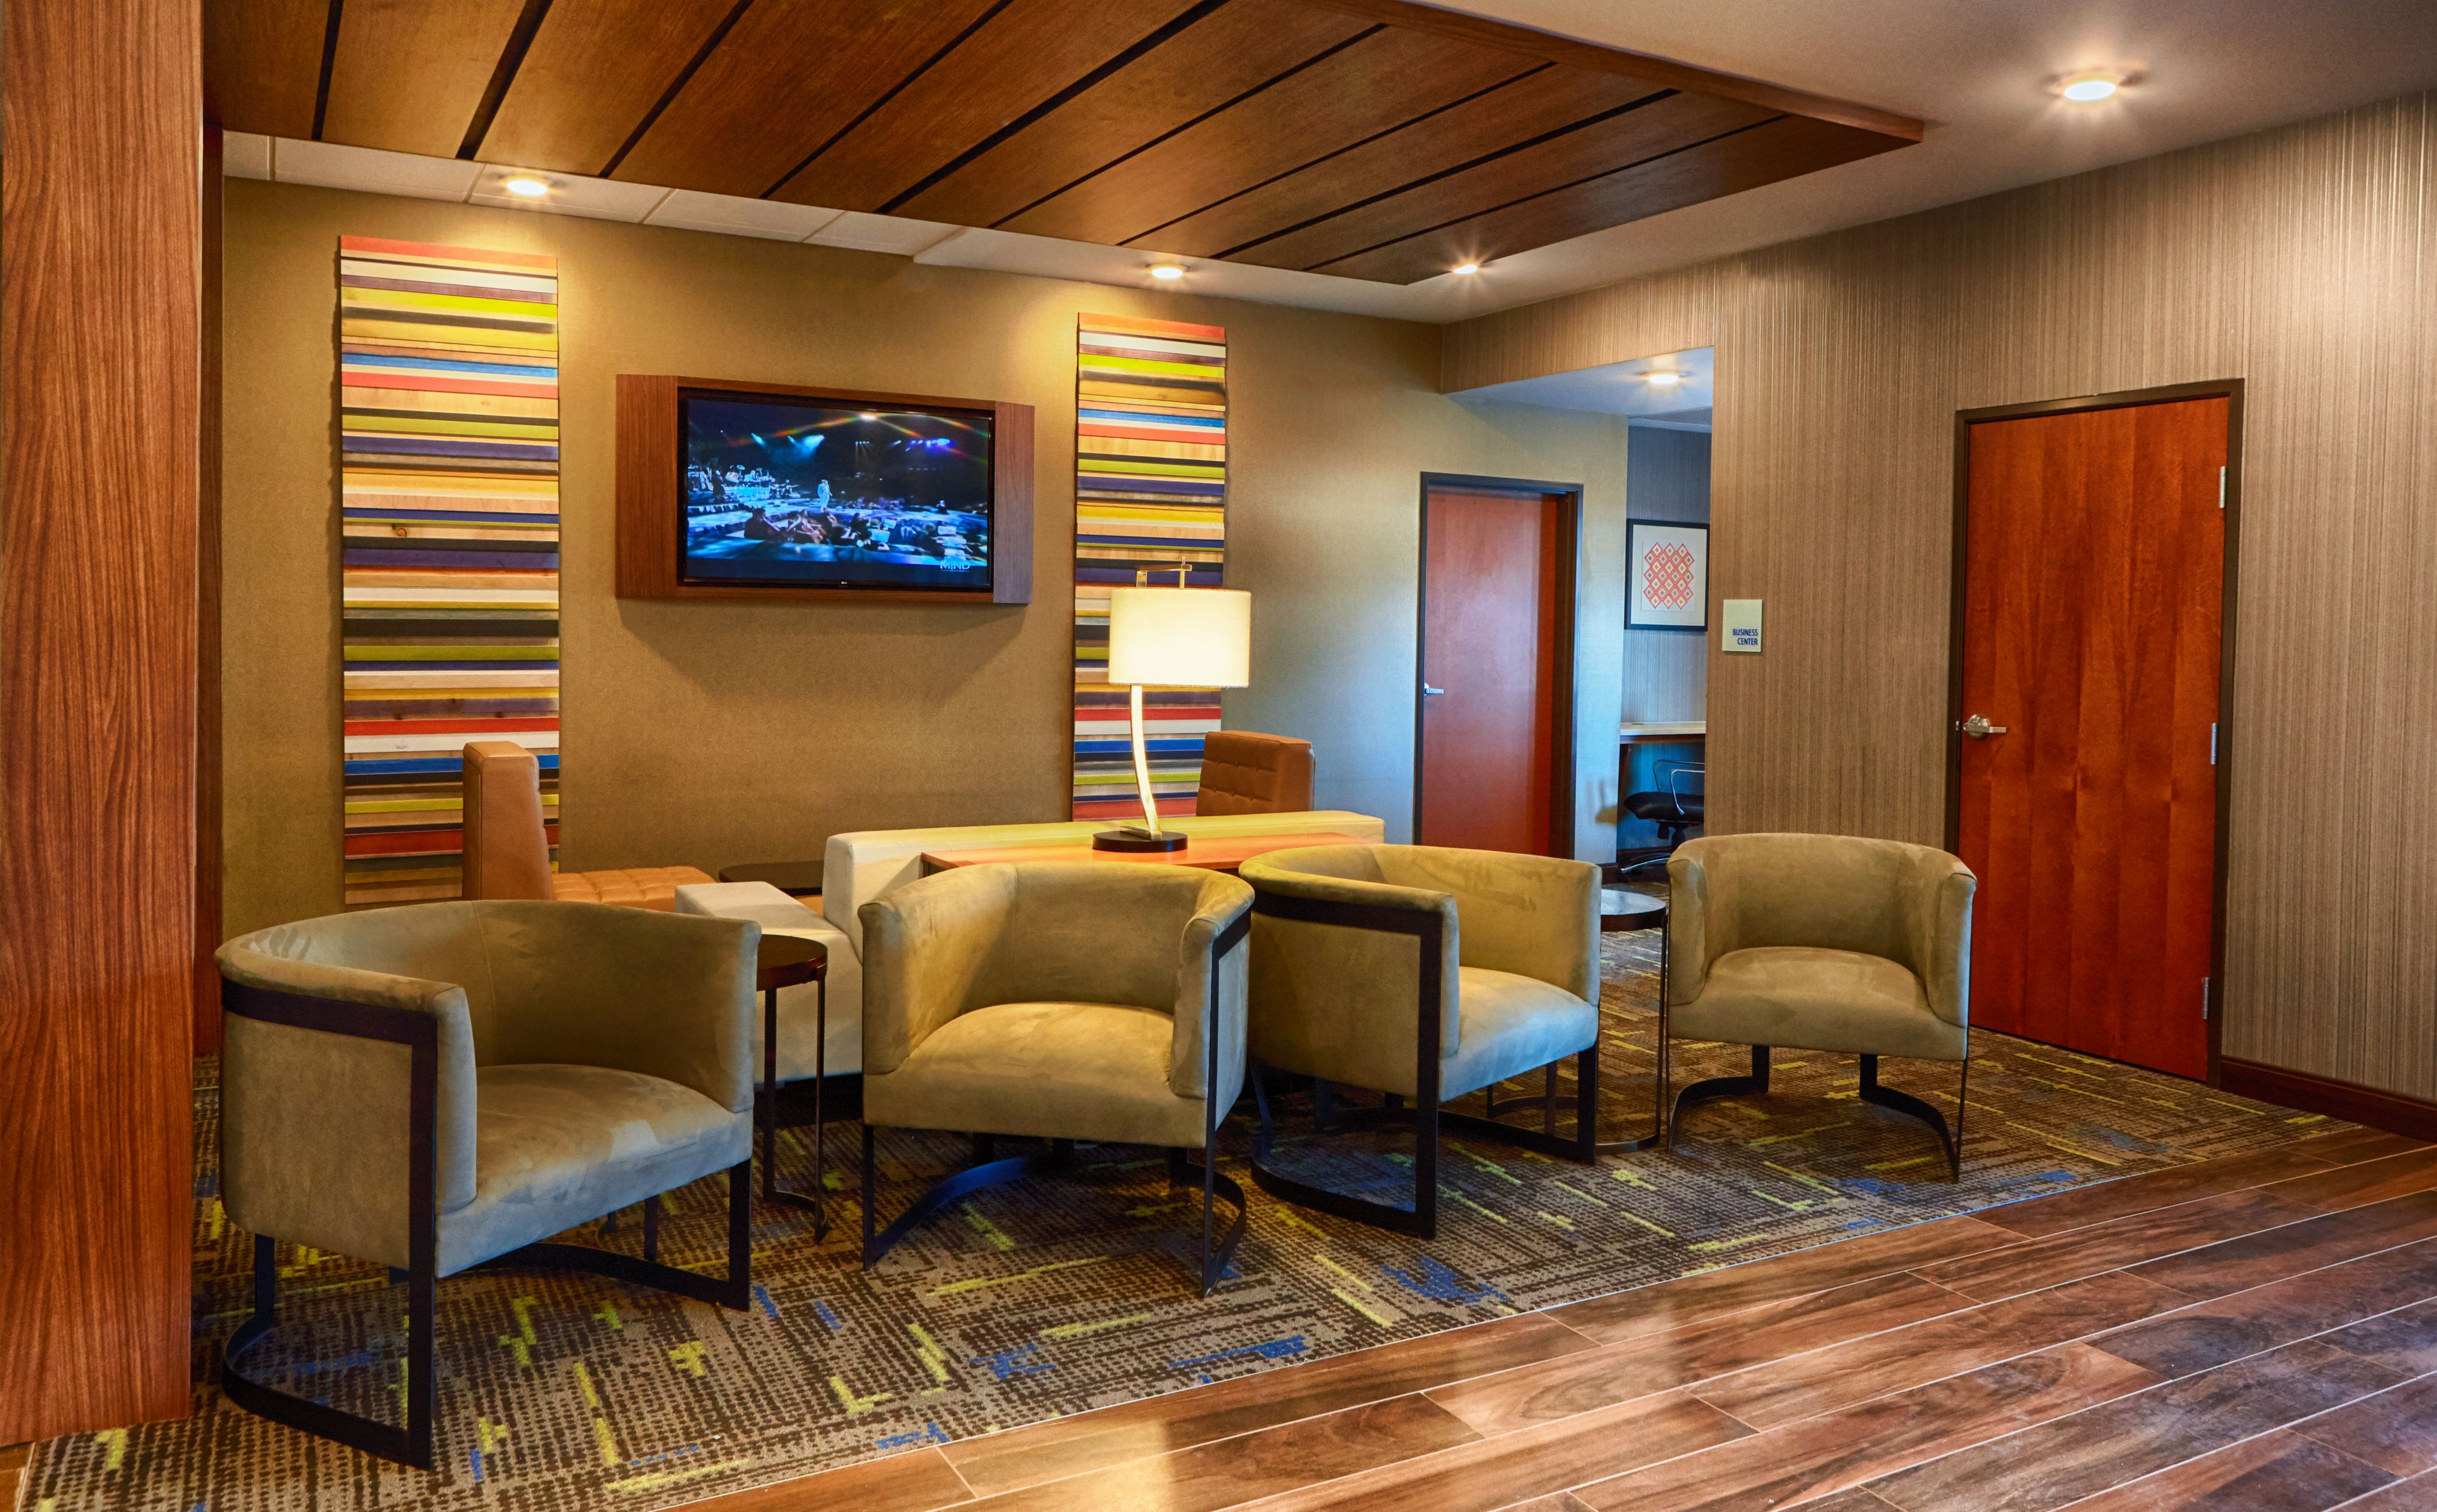 Holiday Inn Express Bordentown - Trenton South image 4